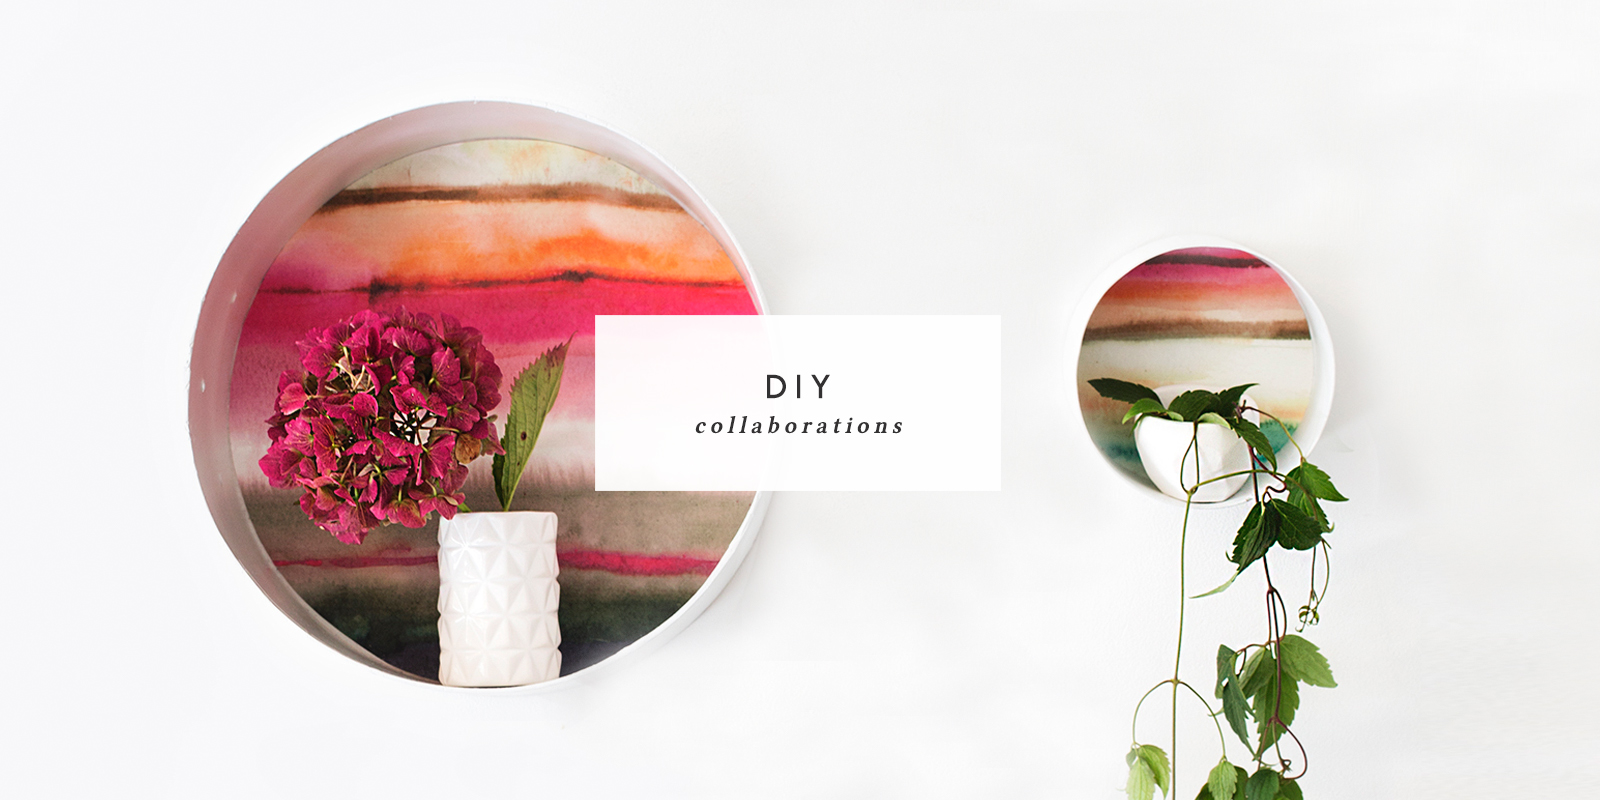 DIY collaborations